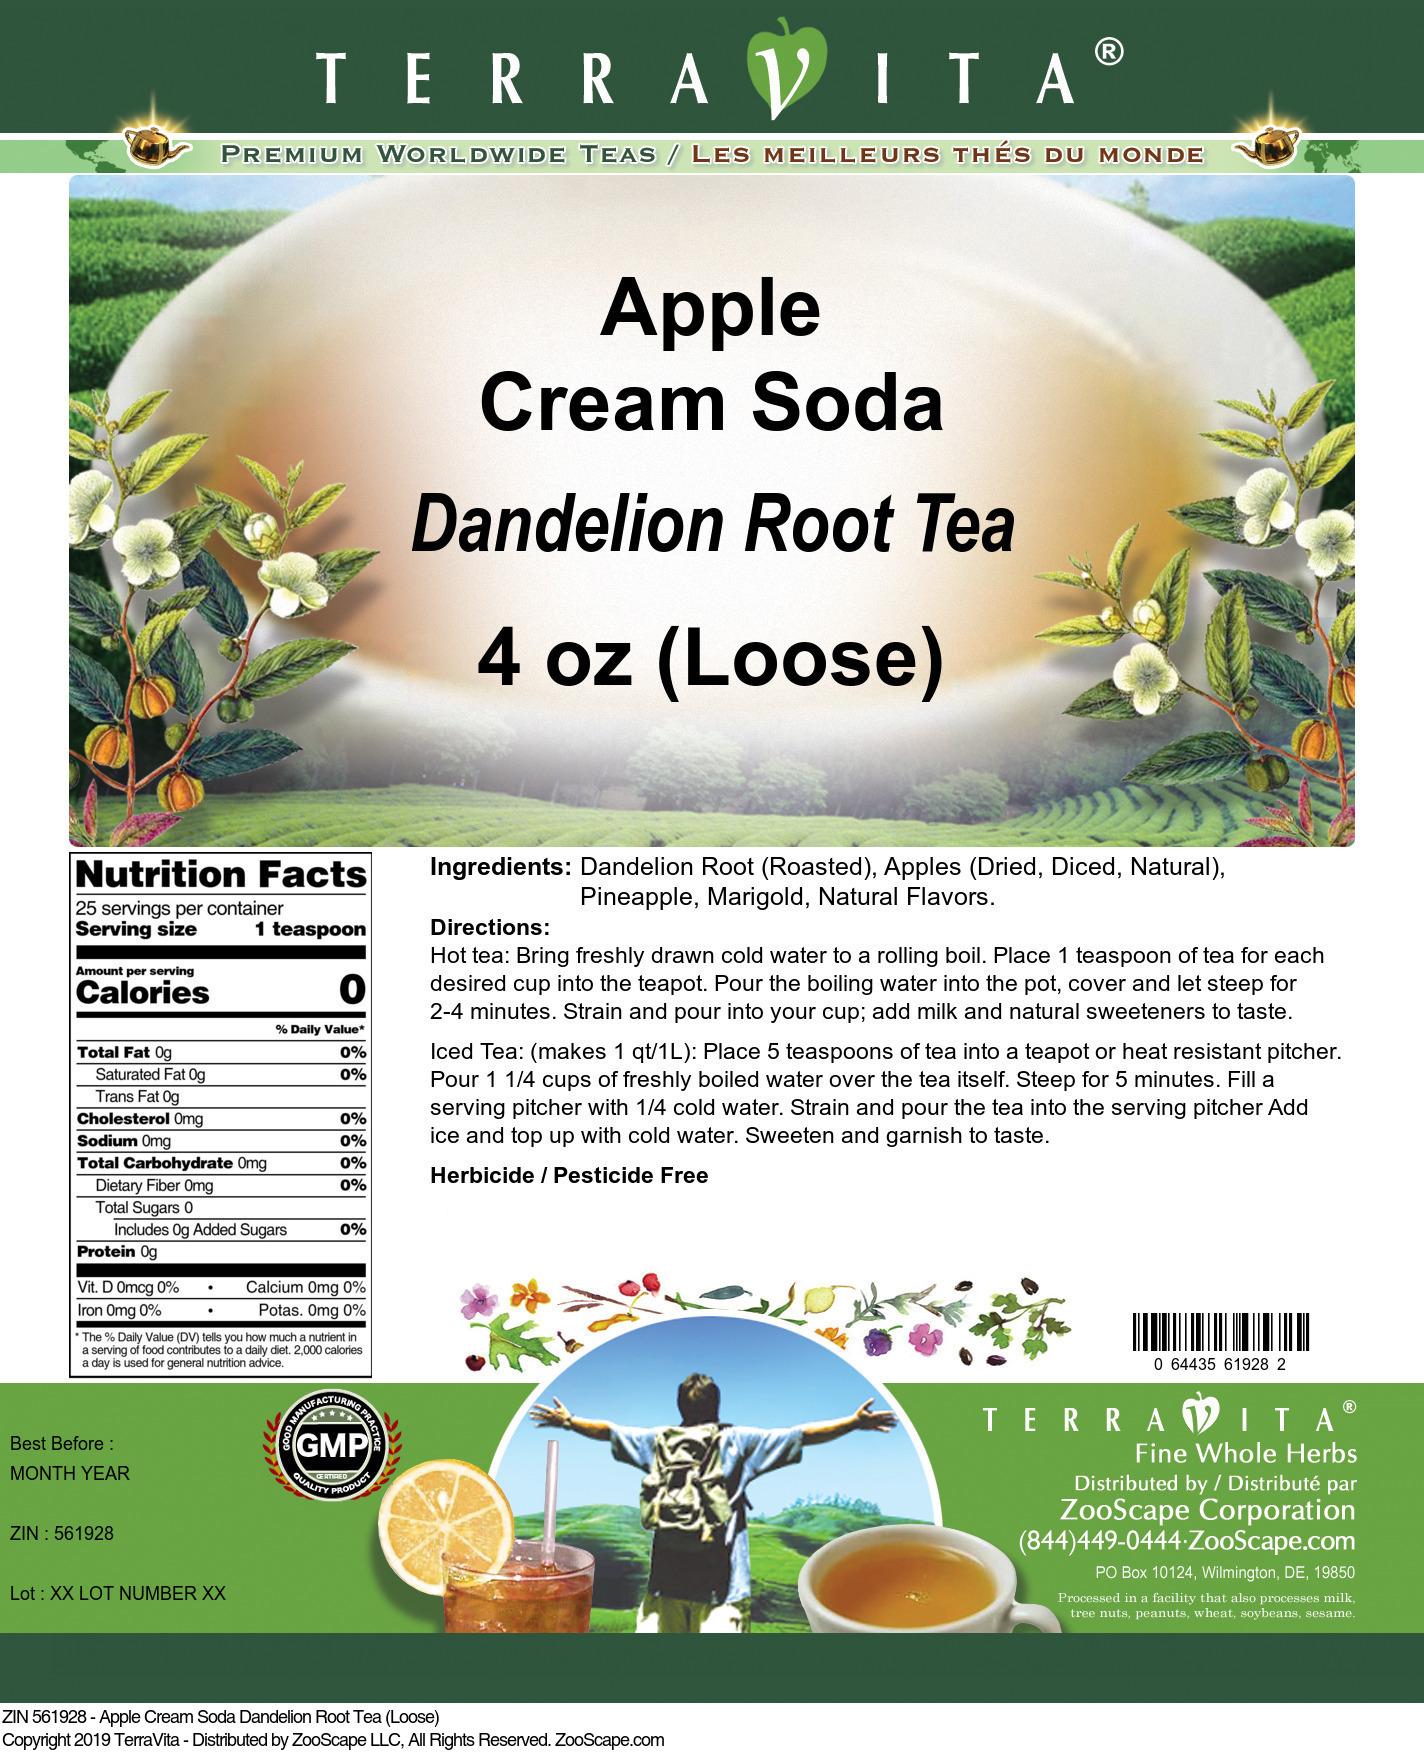 Apple Cream Soda Dandelion Root Tea (Loose)